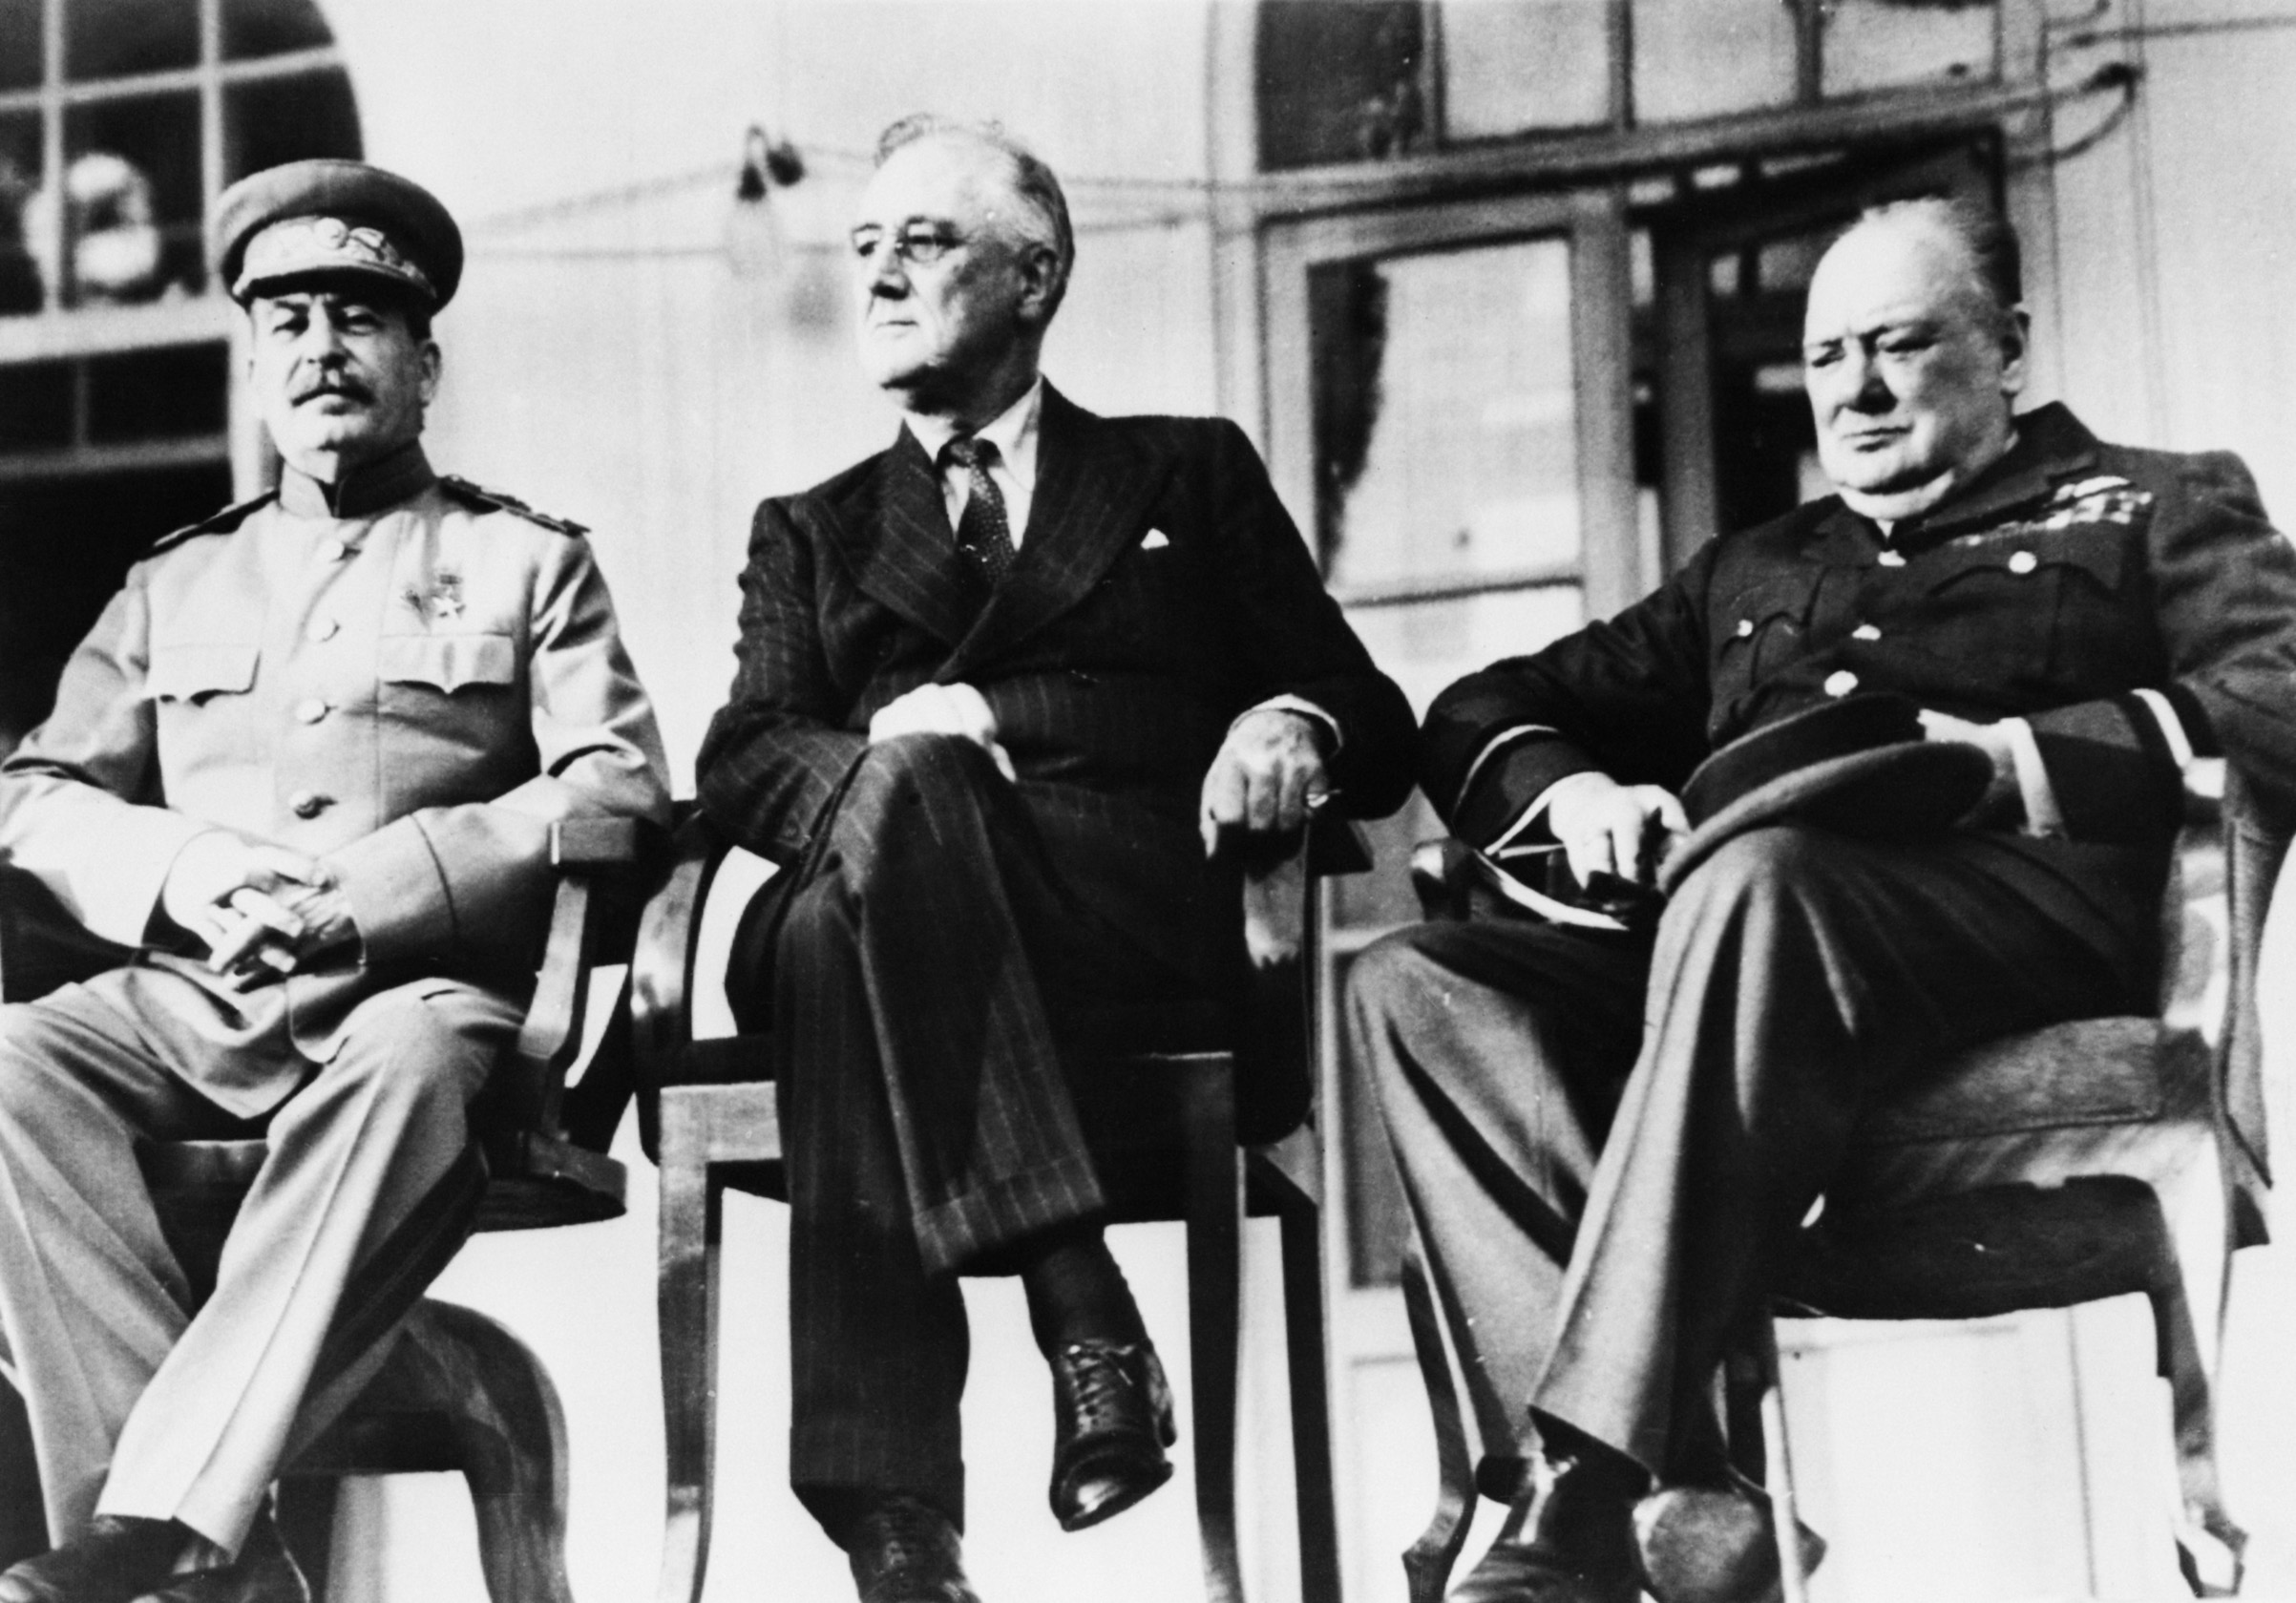 The historic meeting of the 'Big Three' in Teheran, Dec. 1943. Left to right: Soviet dictator Marshal Joseph Stalin (1879-1953), U.S President Franklin Delano Roosevelt (1882-1945) and British Prime Minister Winston Churchill (1874-1965).